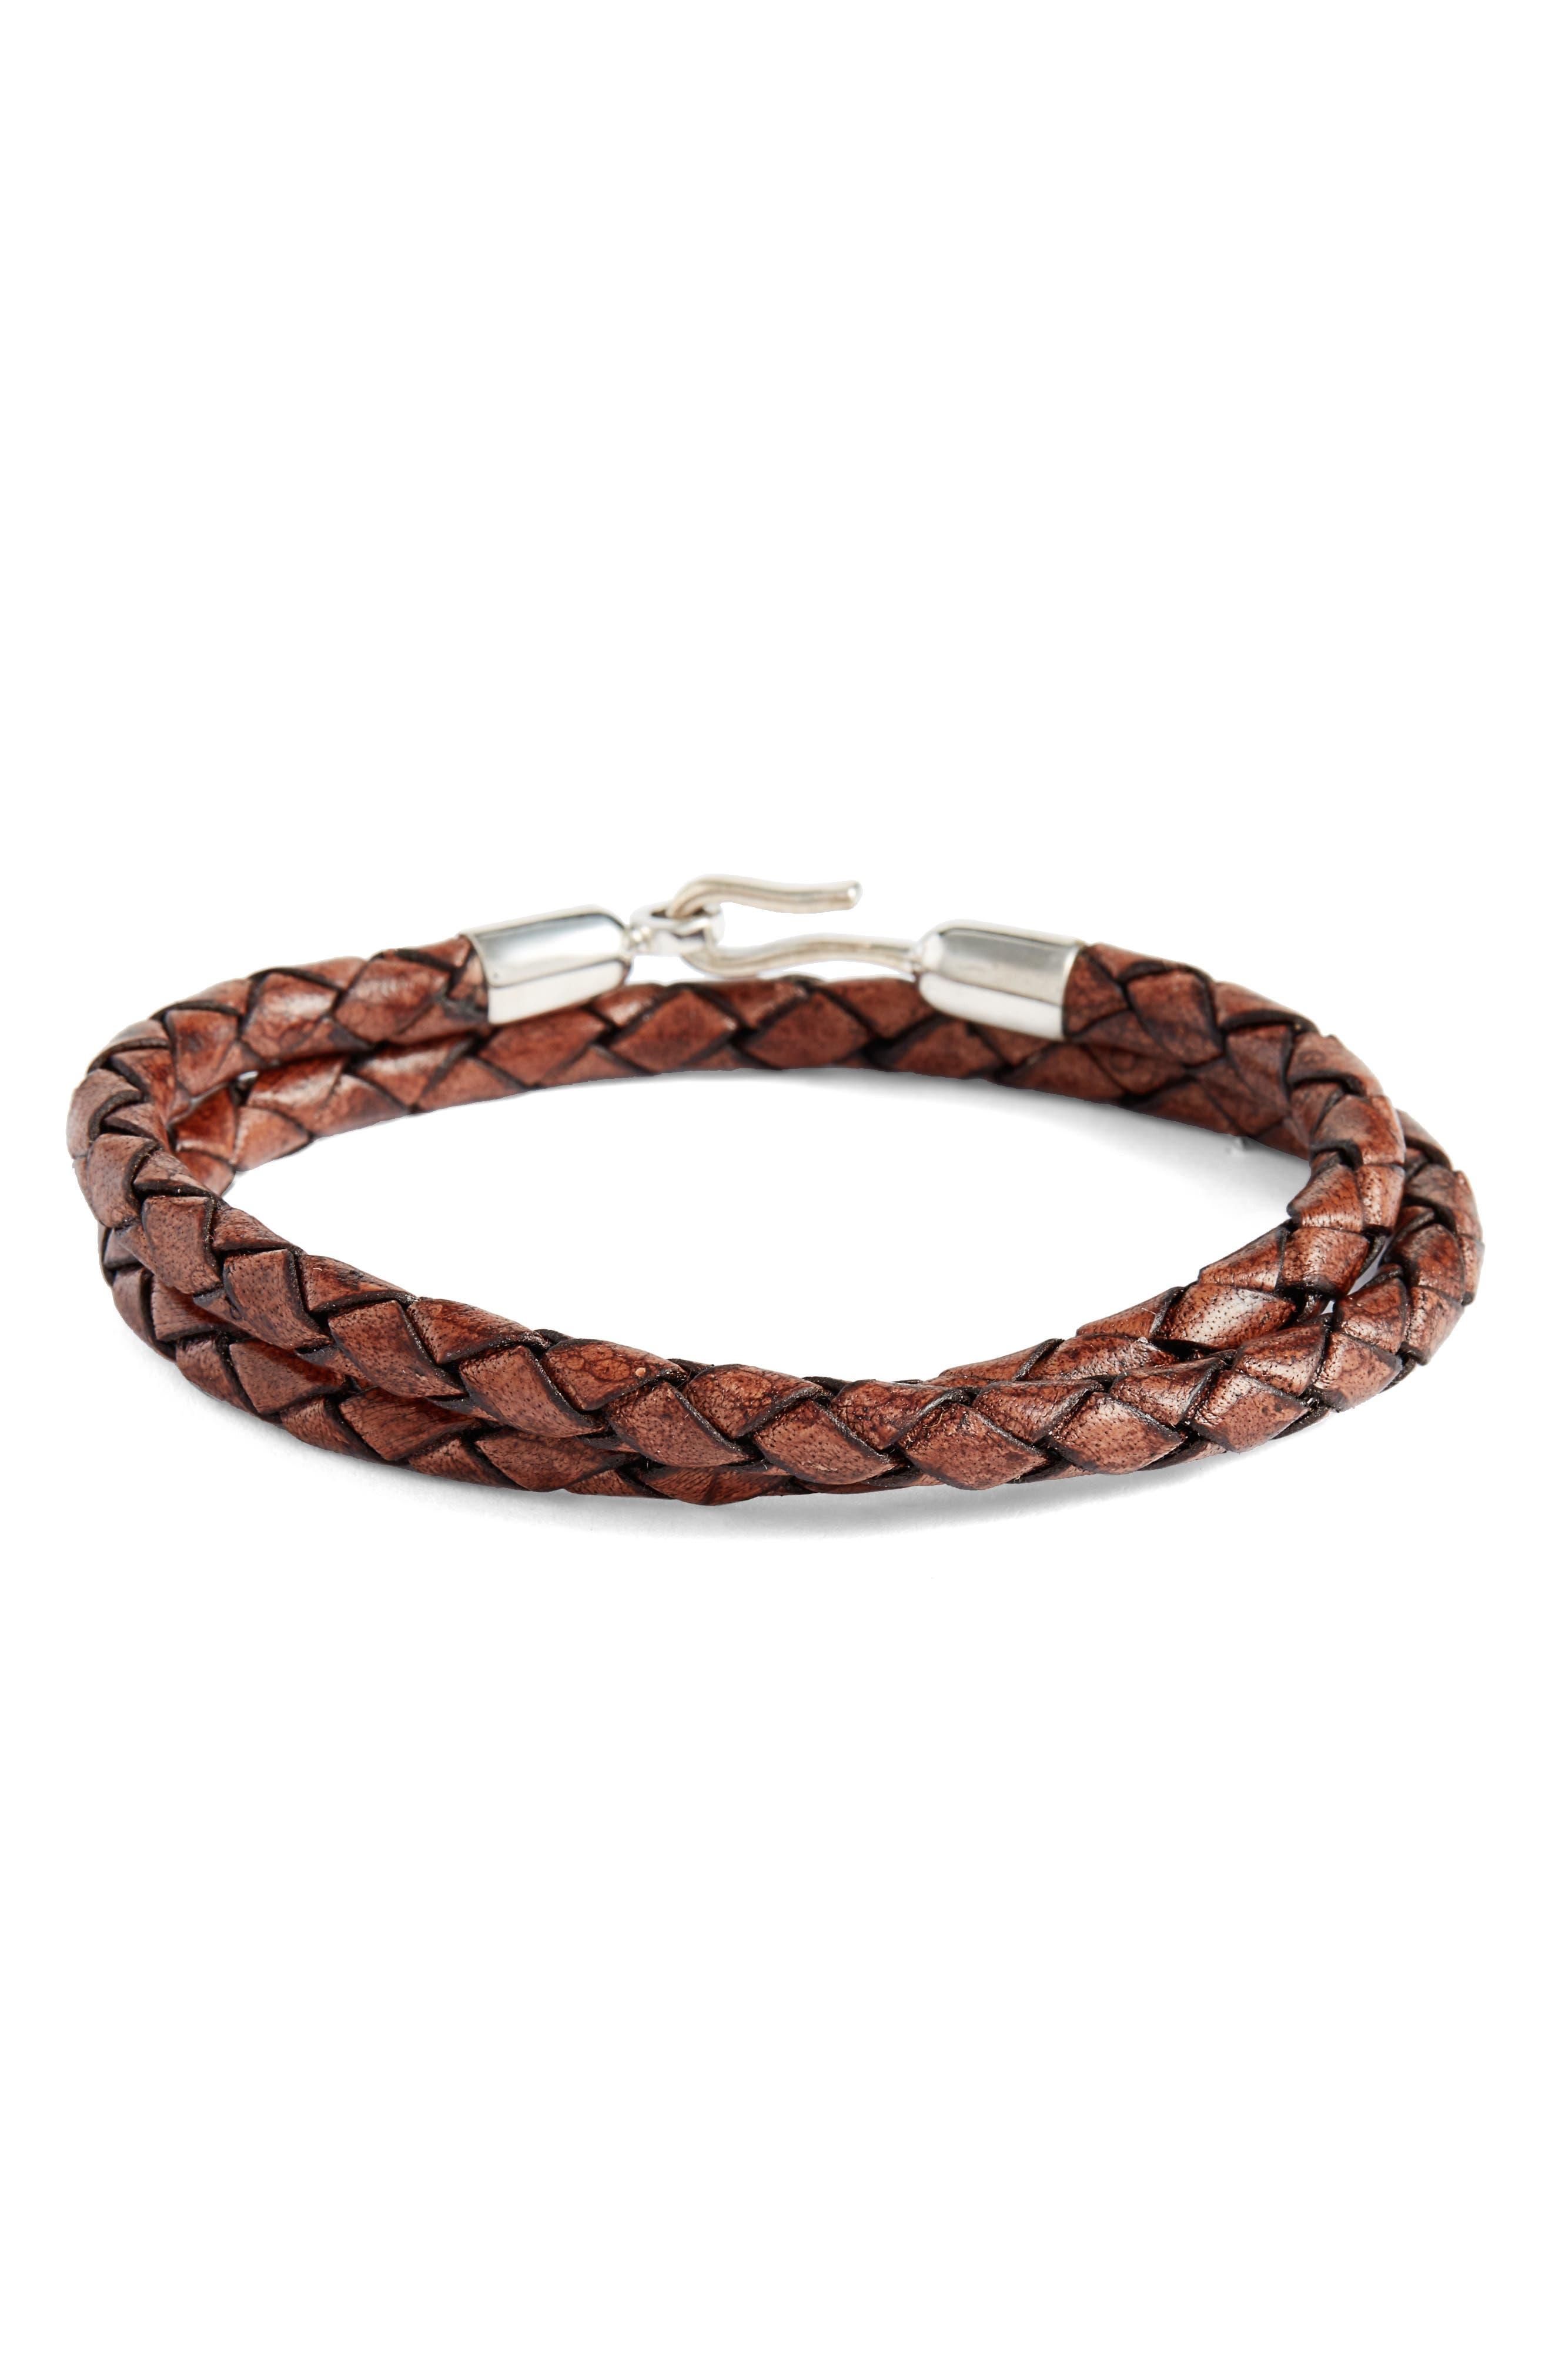 Braided Leather Wrap Bracelet,                         Main,                         color, Antique Brown